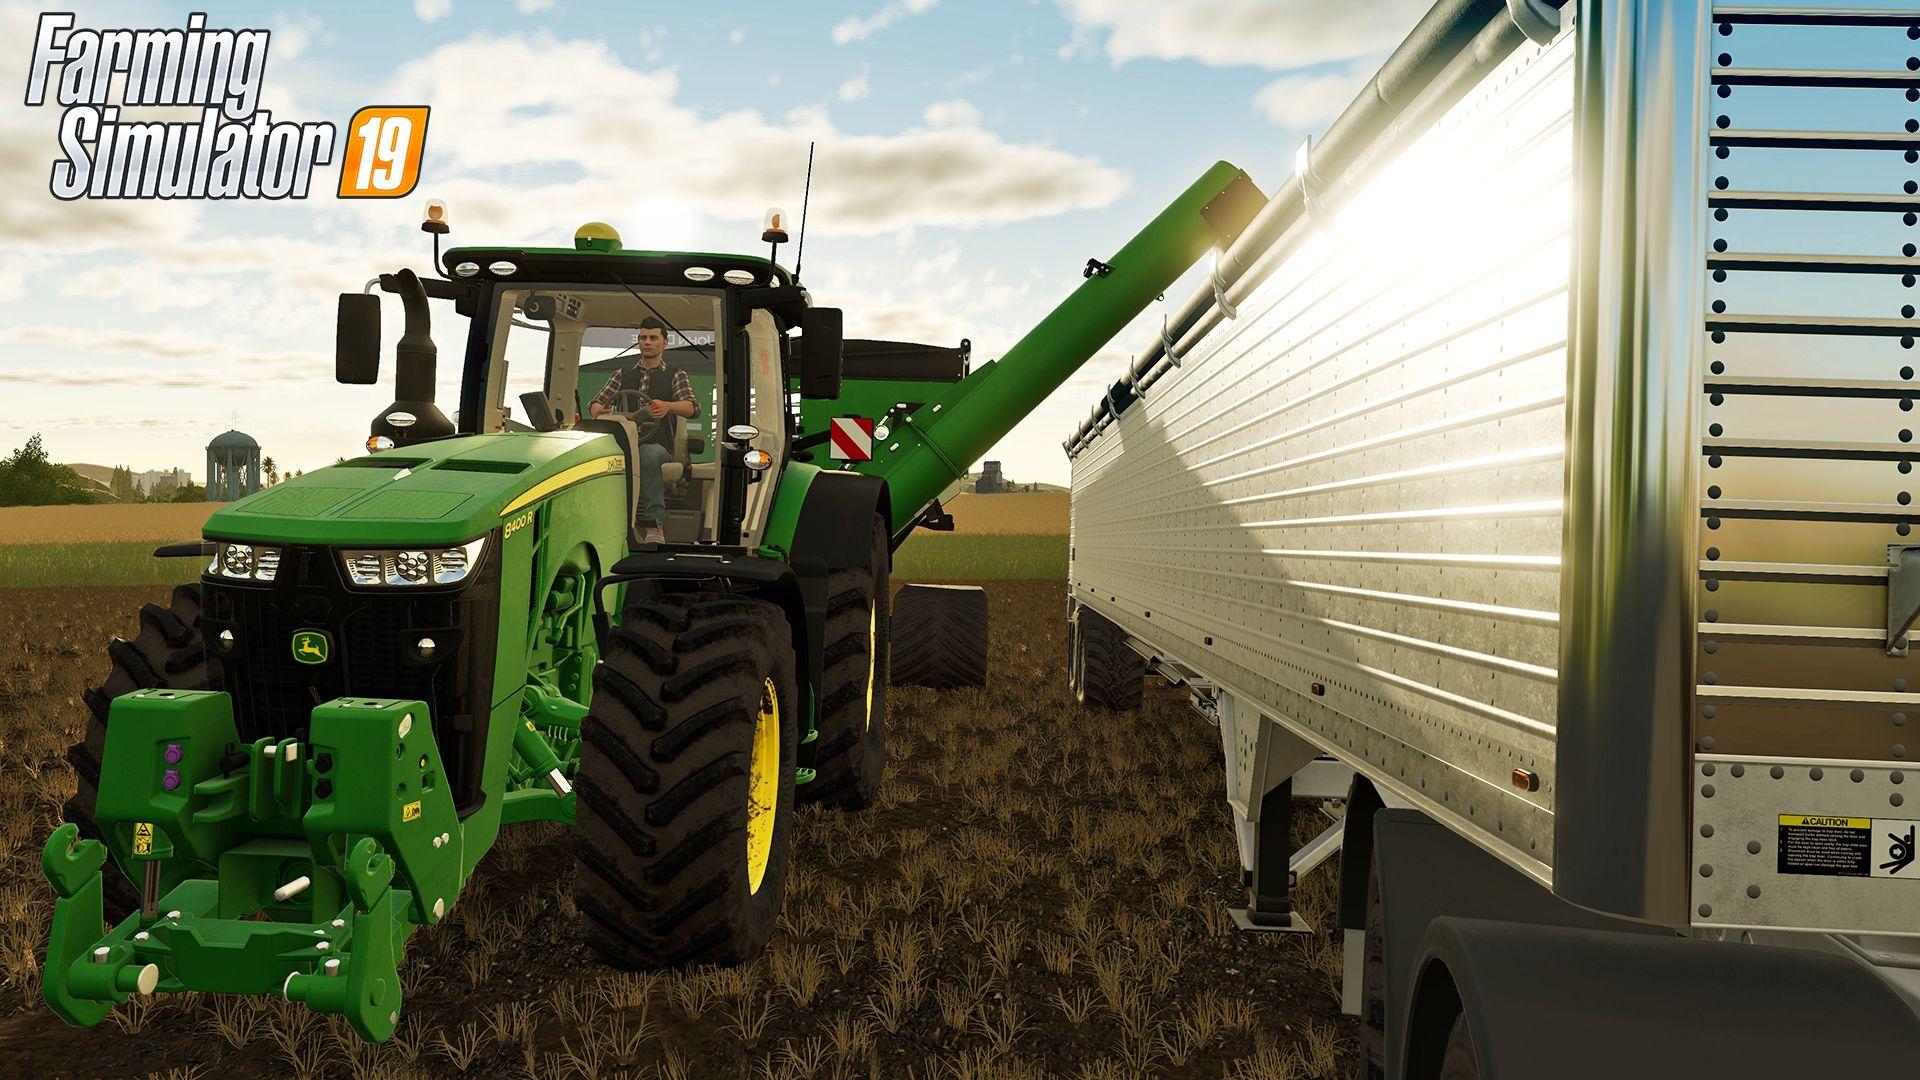 Farming Simulator 19 Trailer Teases Real-Time Crop